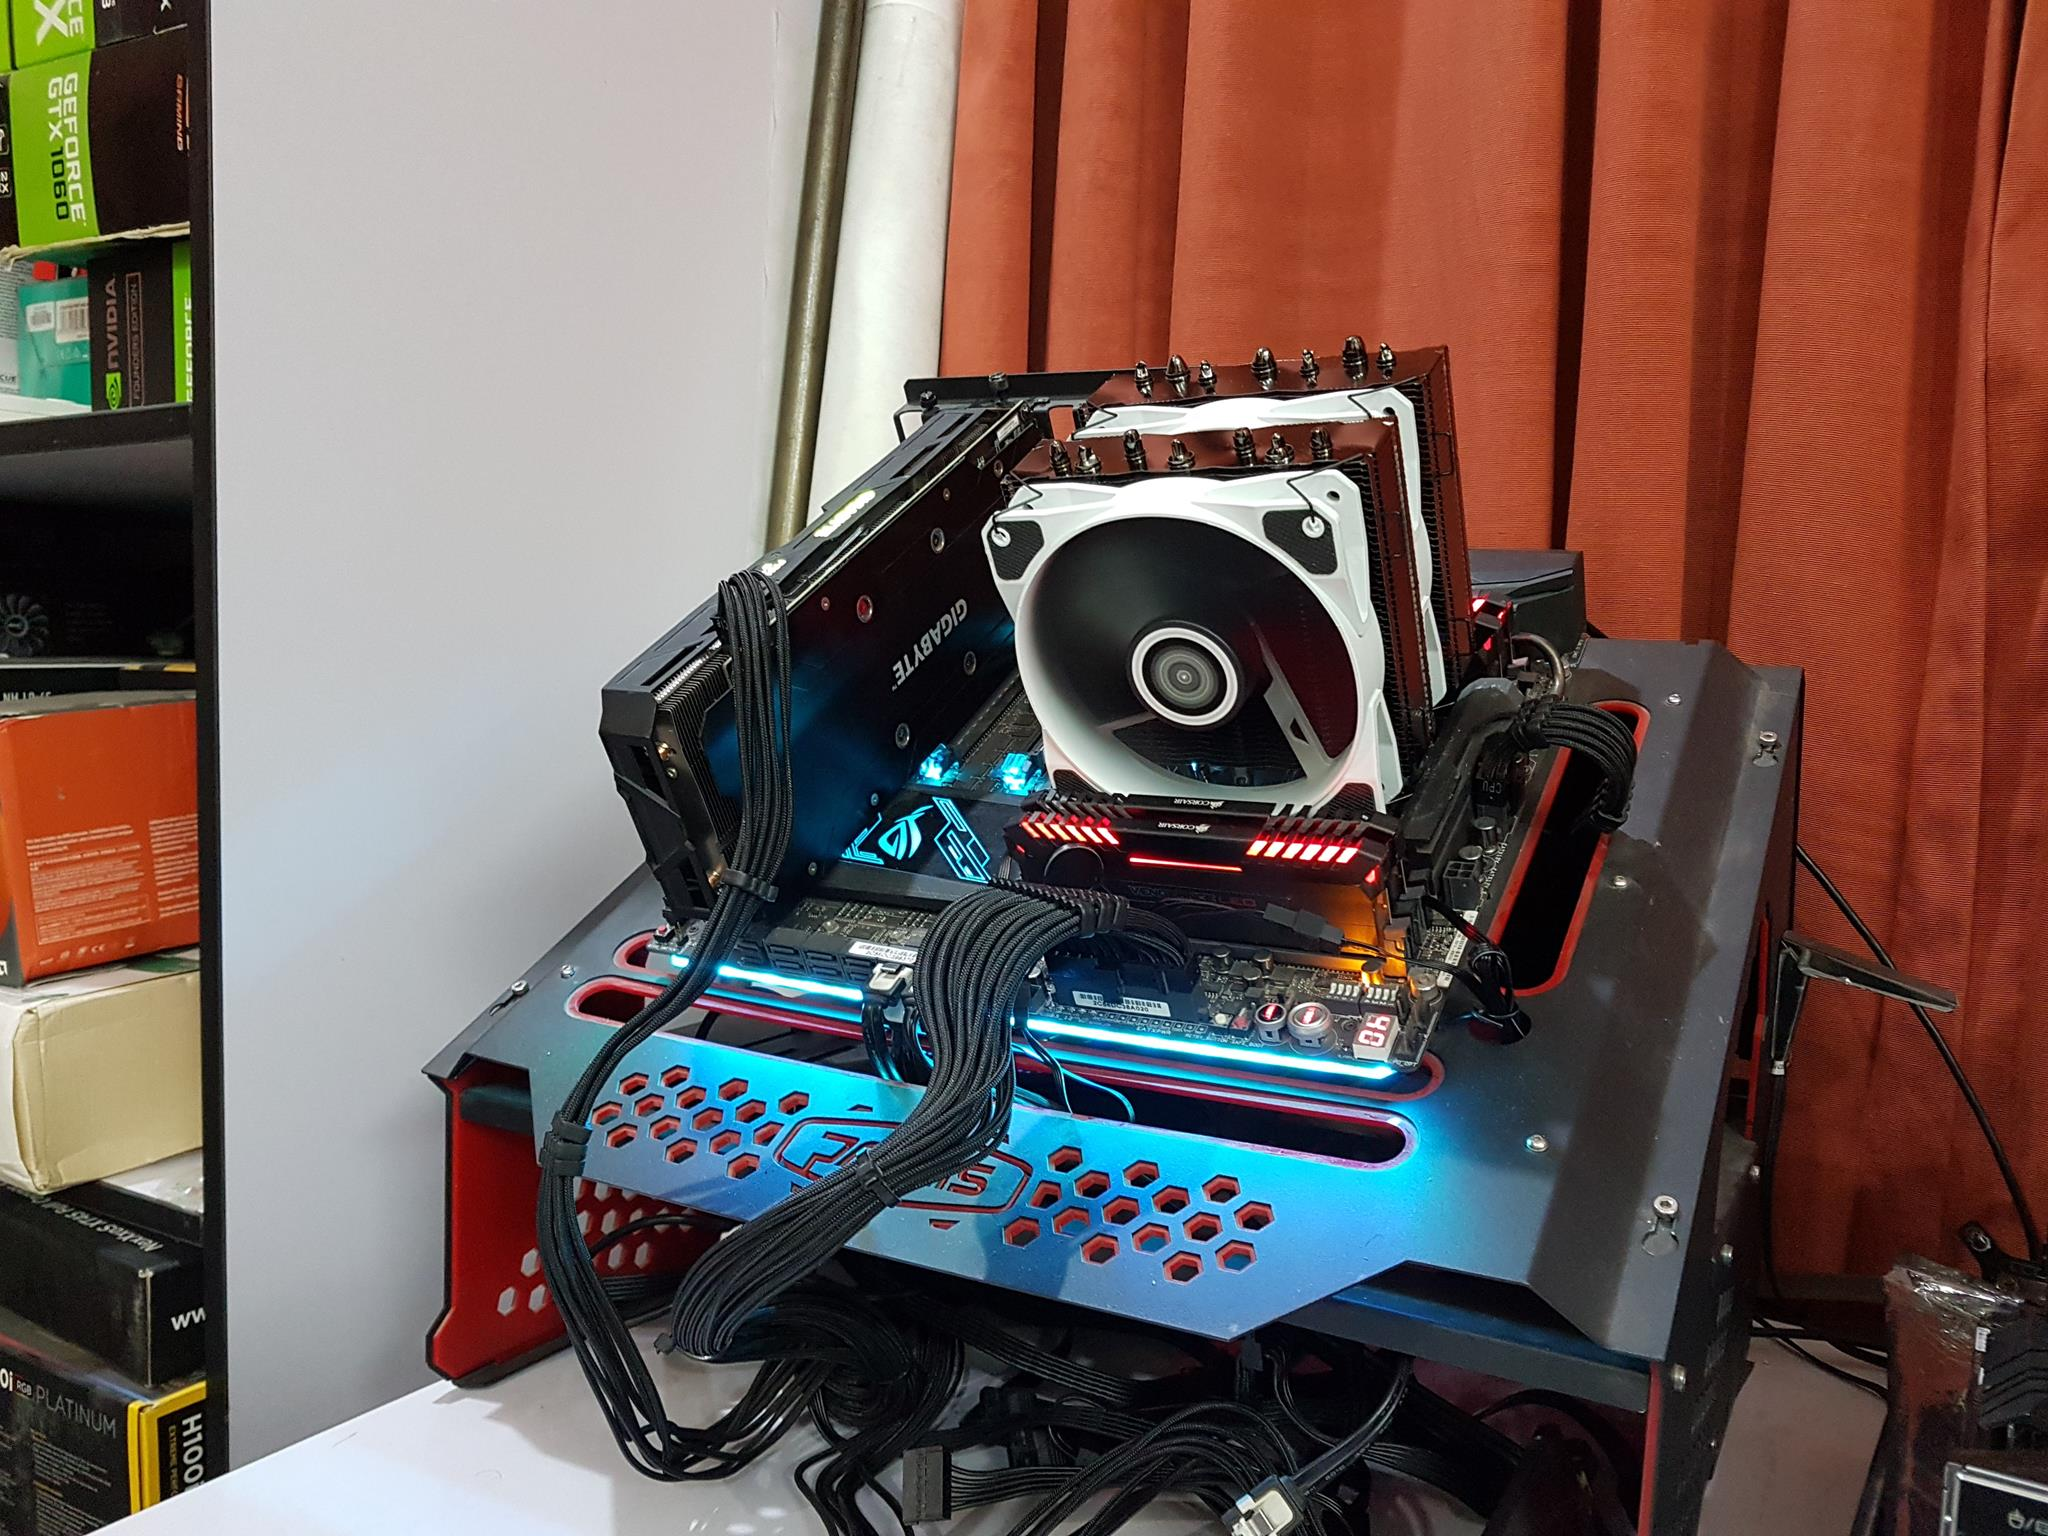 GELID Solutions Phantom Black CPU Air Cooler Review